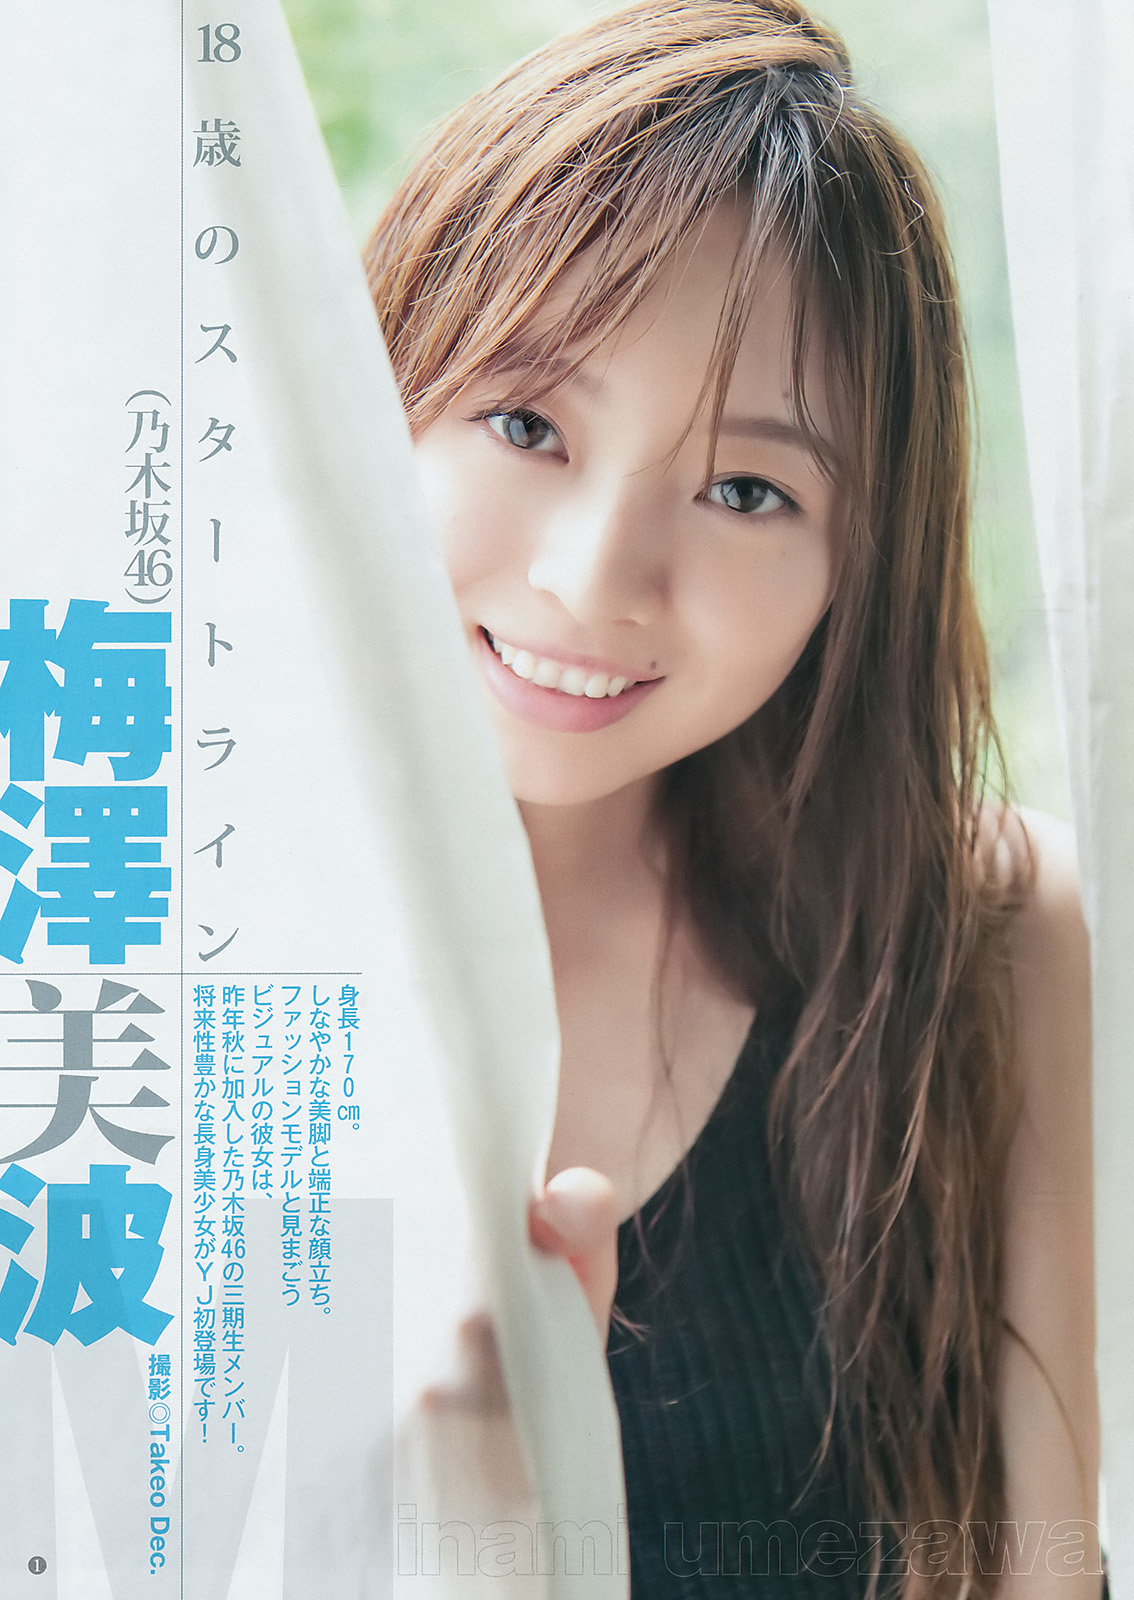 Umezawa Minami 梅澤美波, Young Jump 2017 No.34 (週刊ヤングジャンプ 2017年34号)